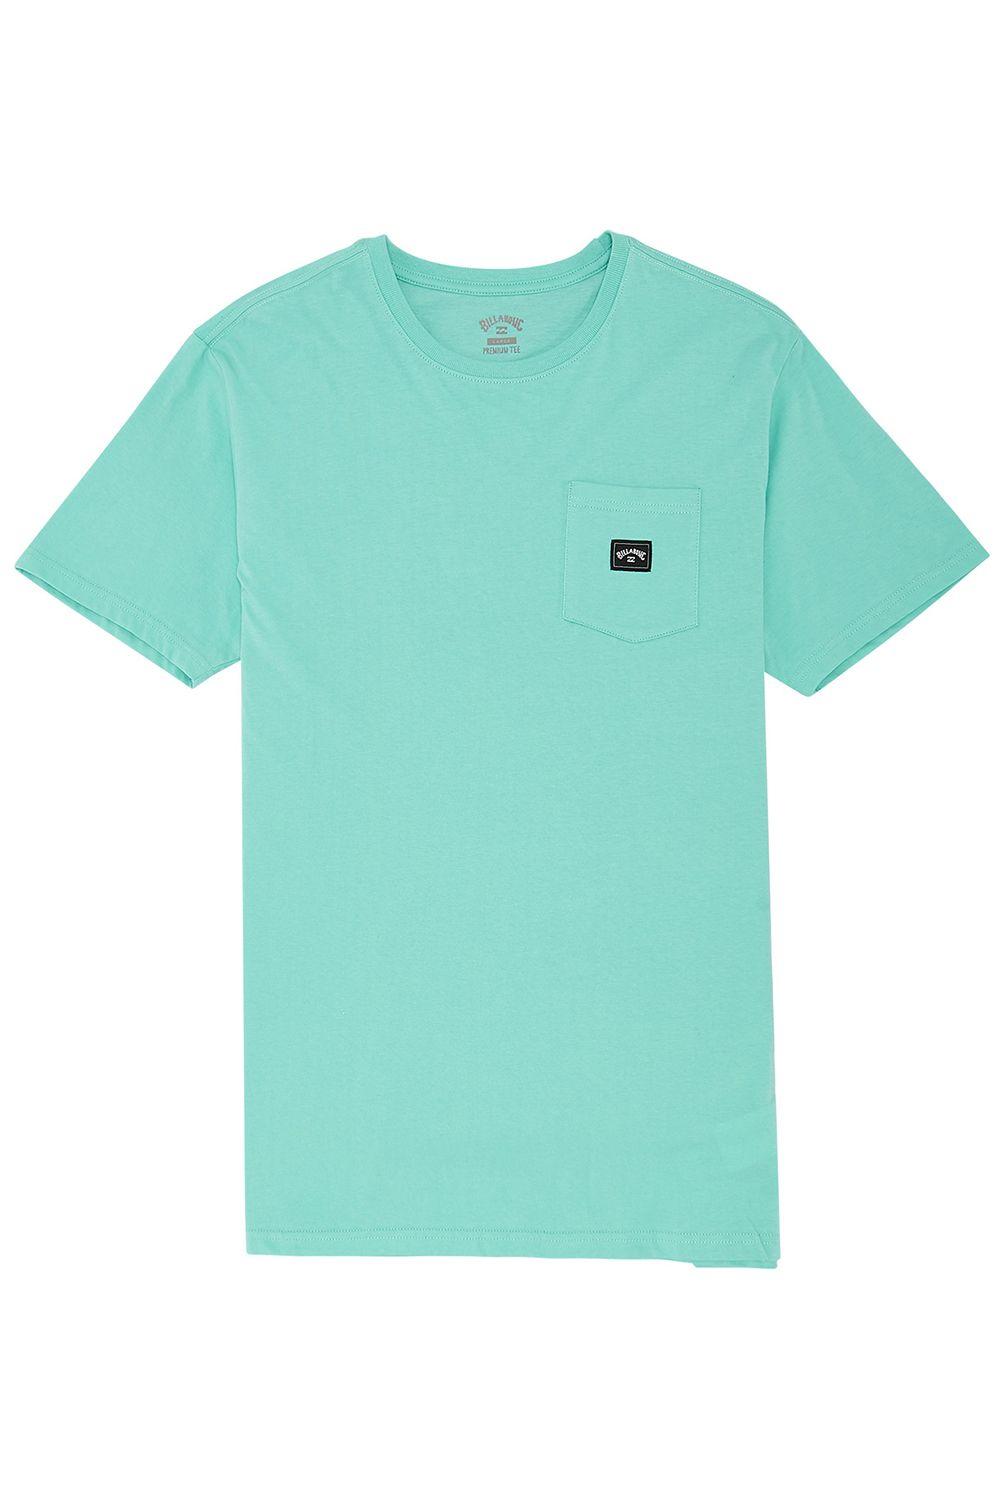 T-Shirt Billabong STACKED Light Aqua